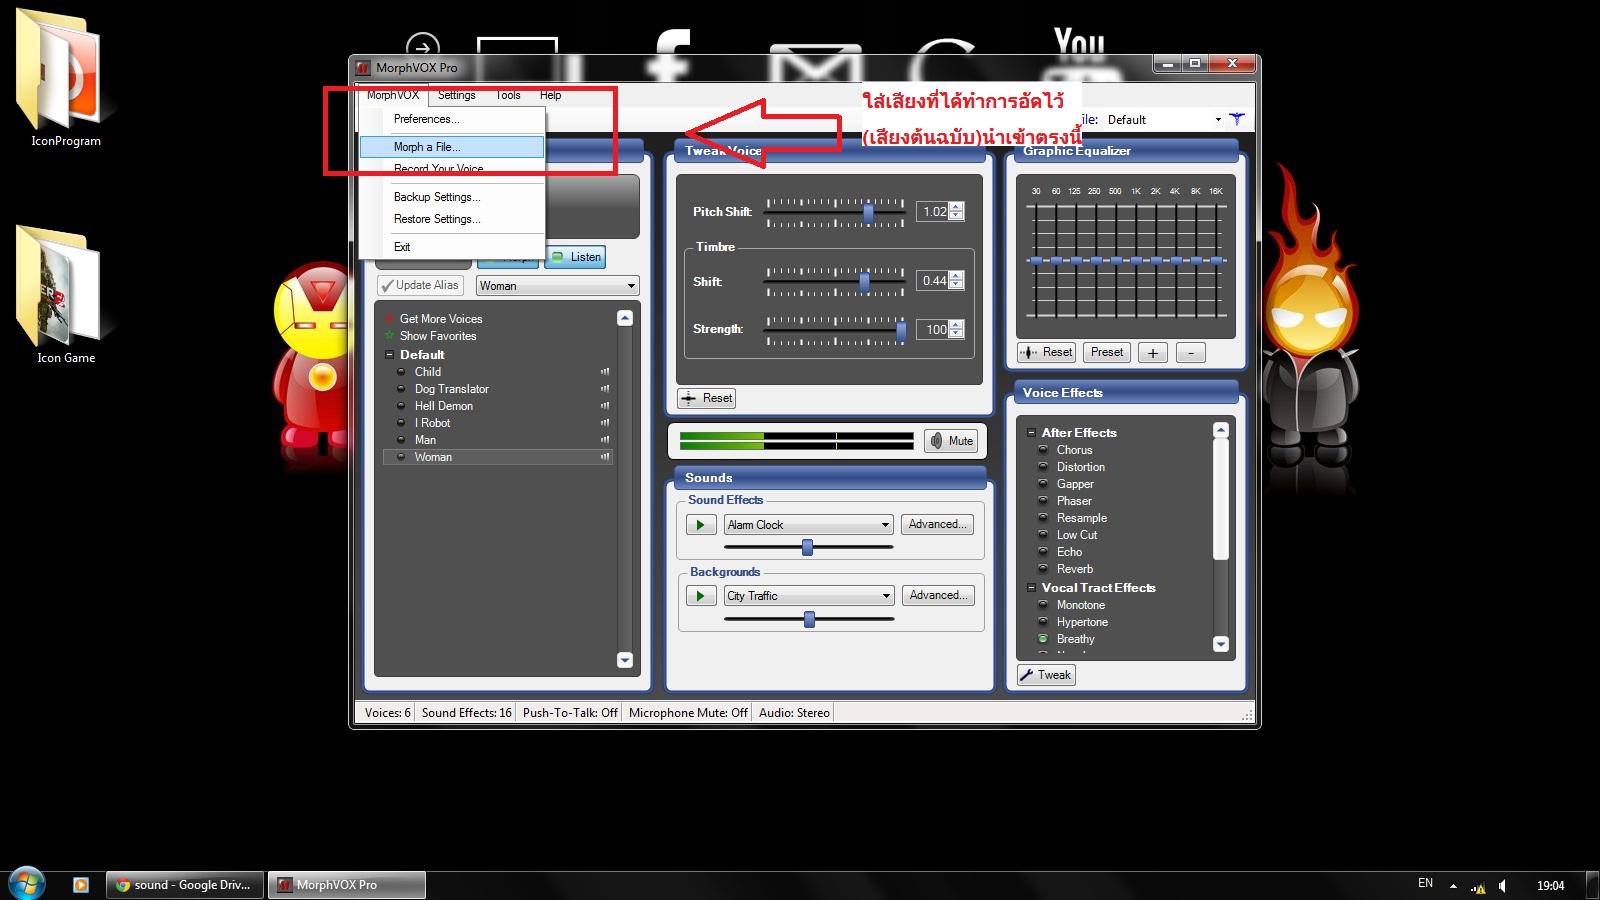 morphvox pro full version free download